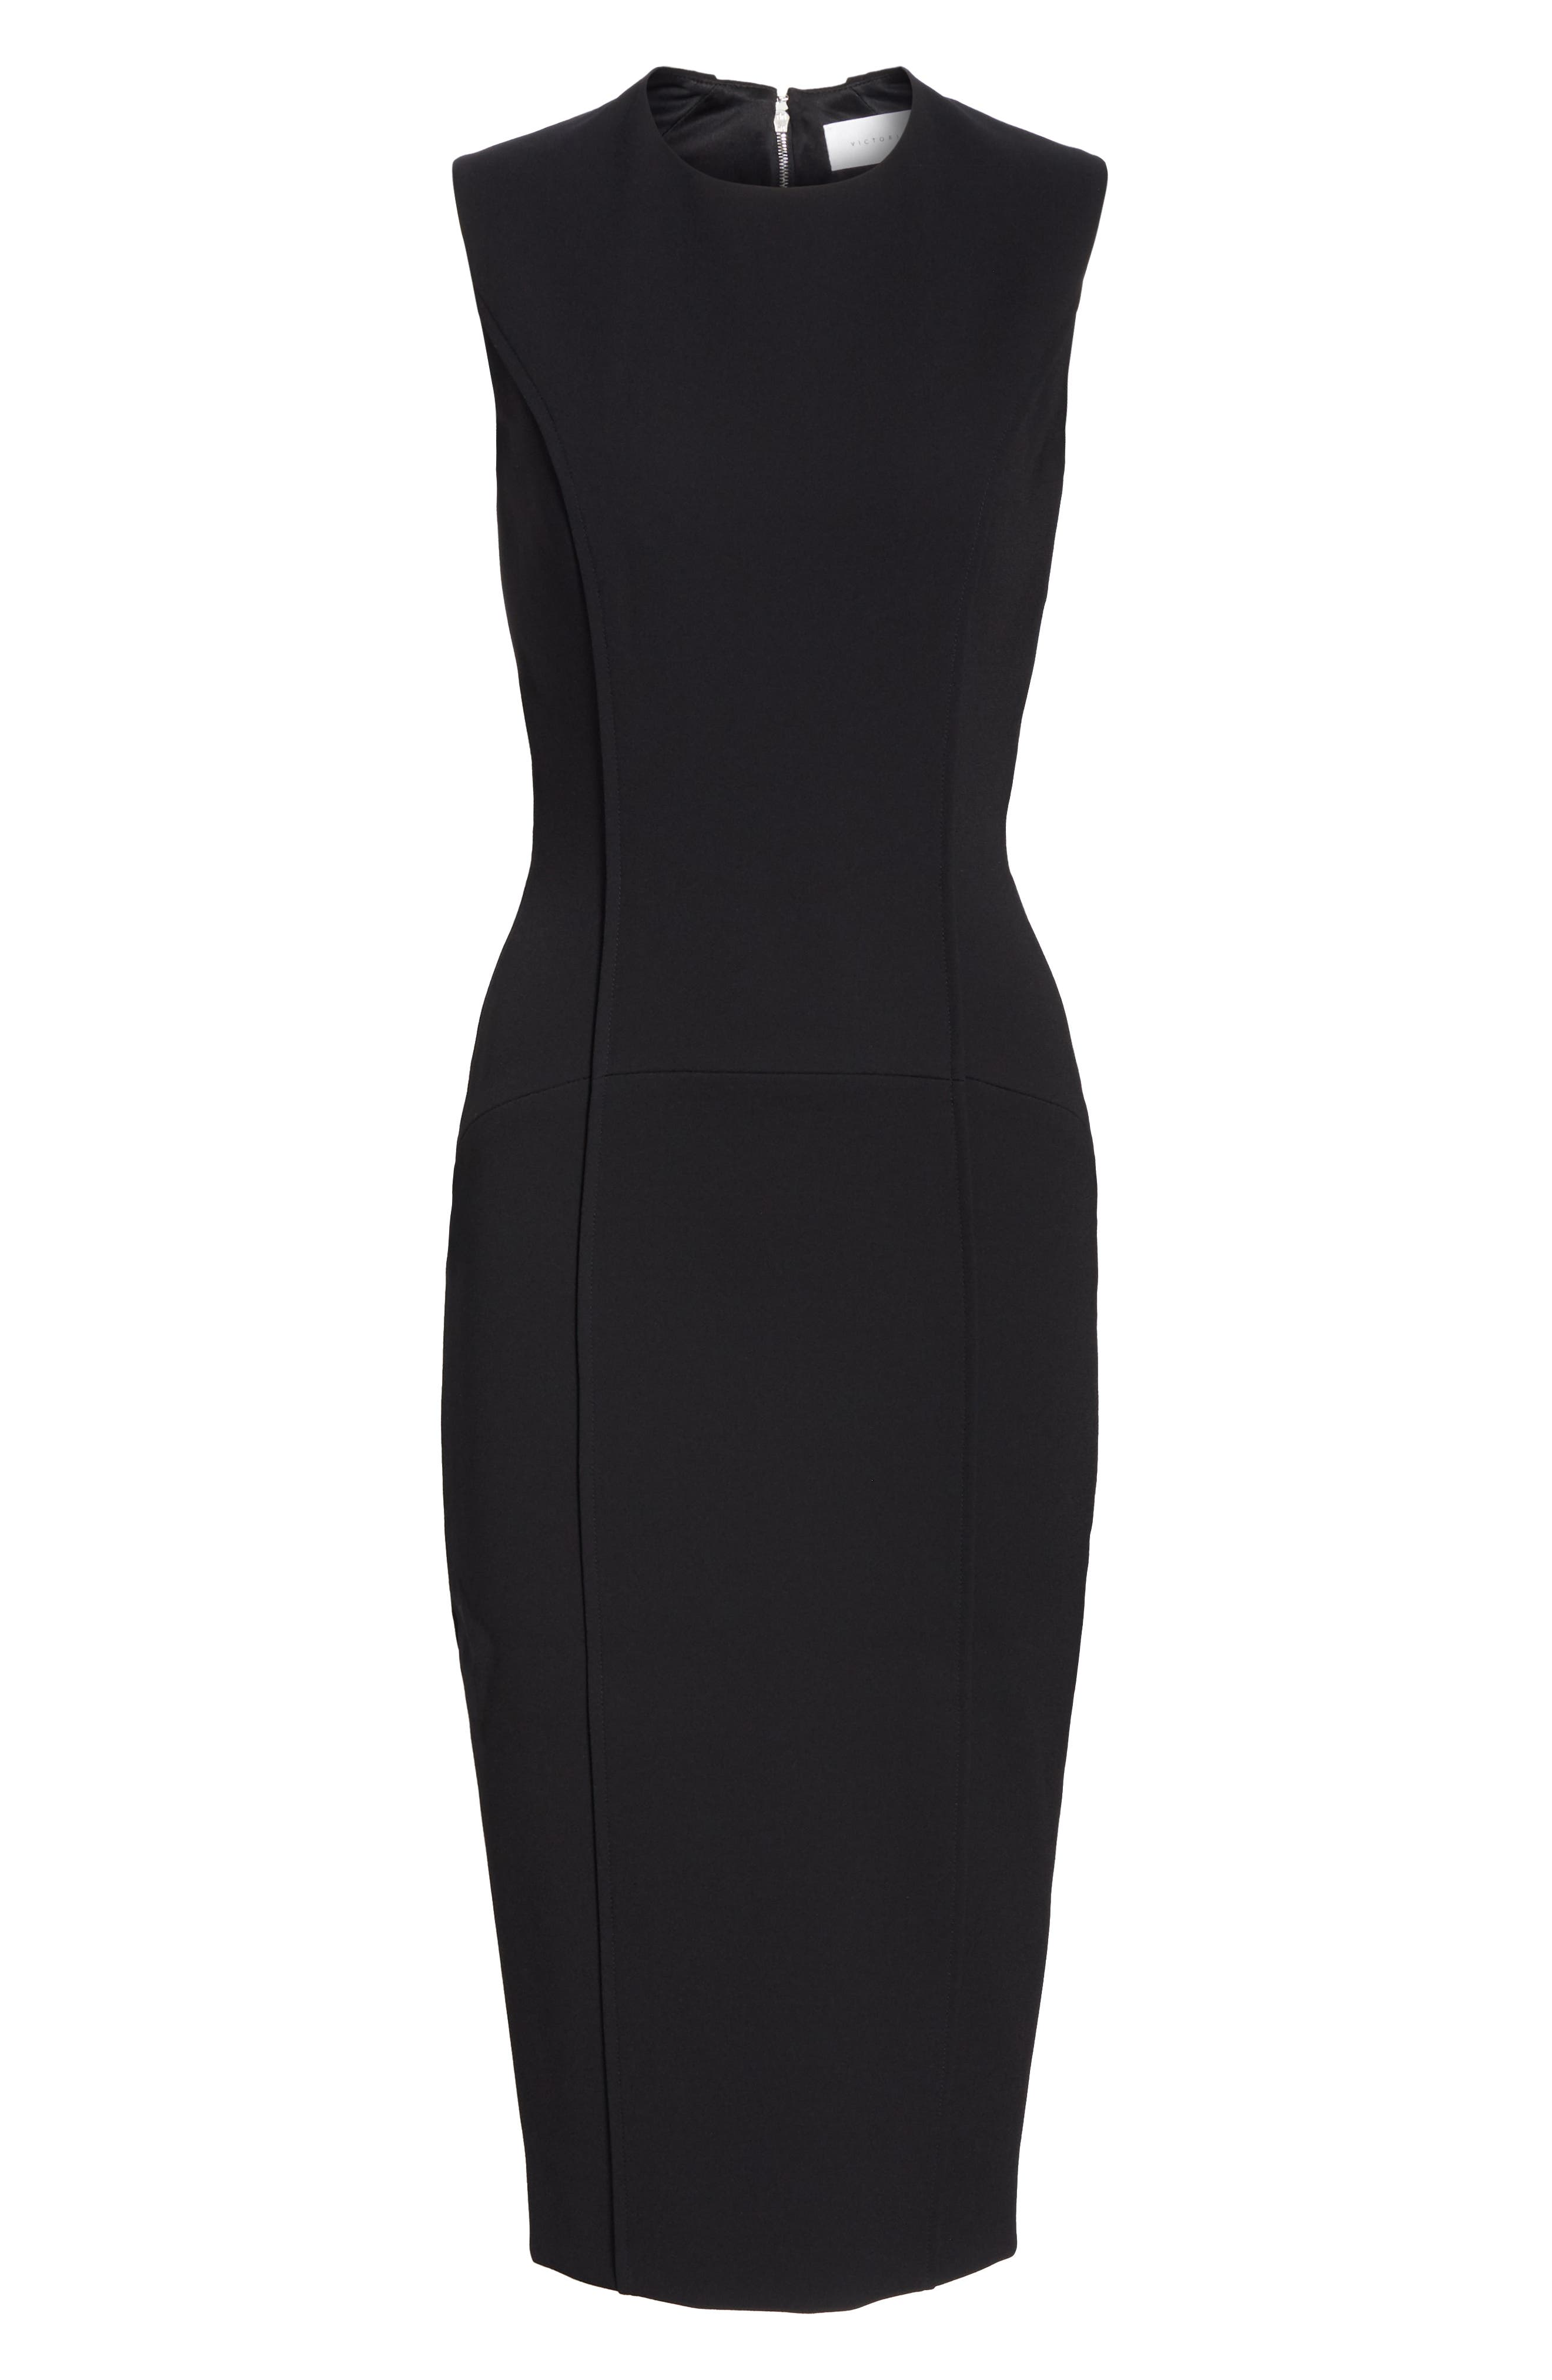 VICTORIA BECKHAM, Back Zip Body-Con Dress, Alternate thumbnail 7, color, BLACK